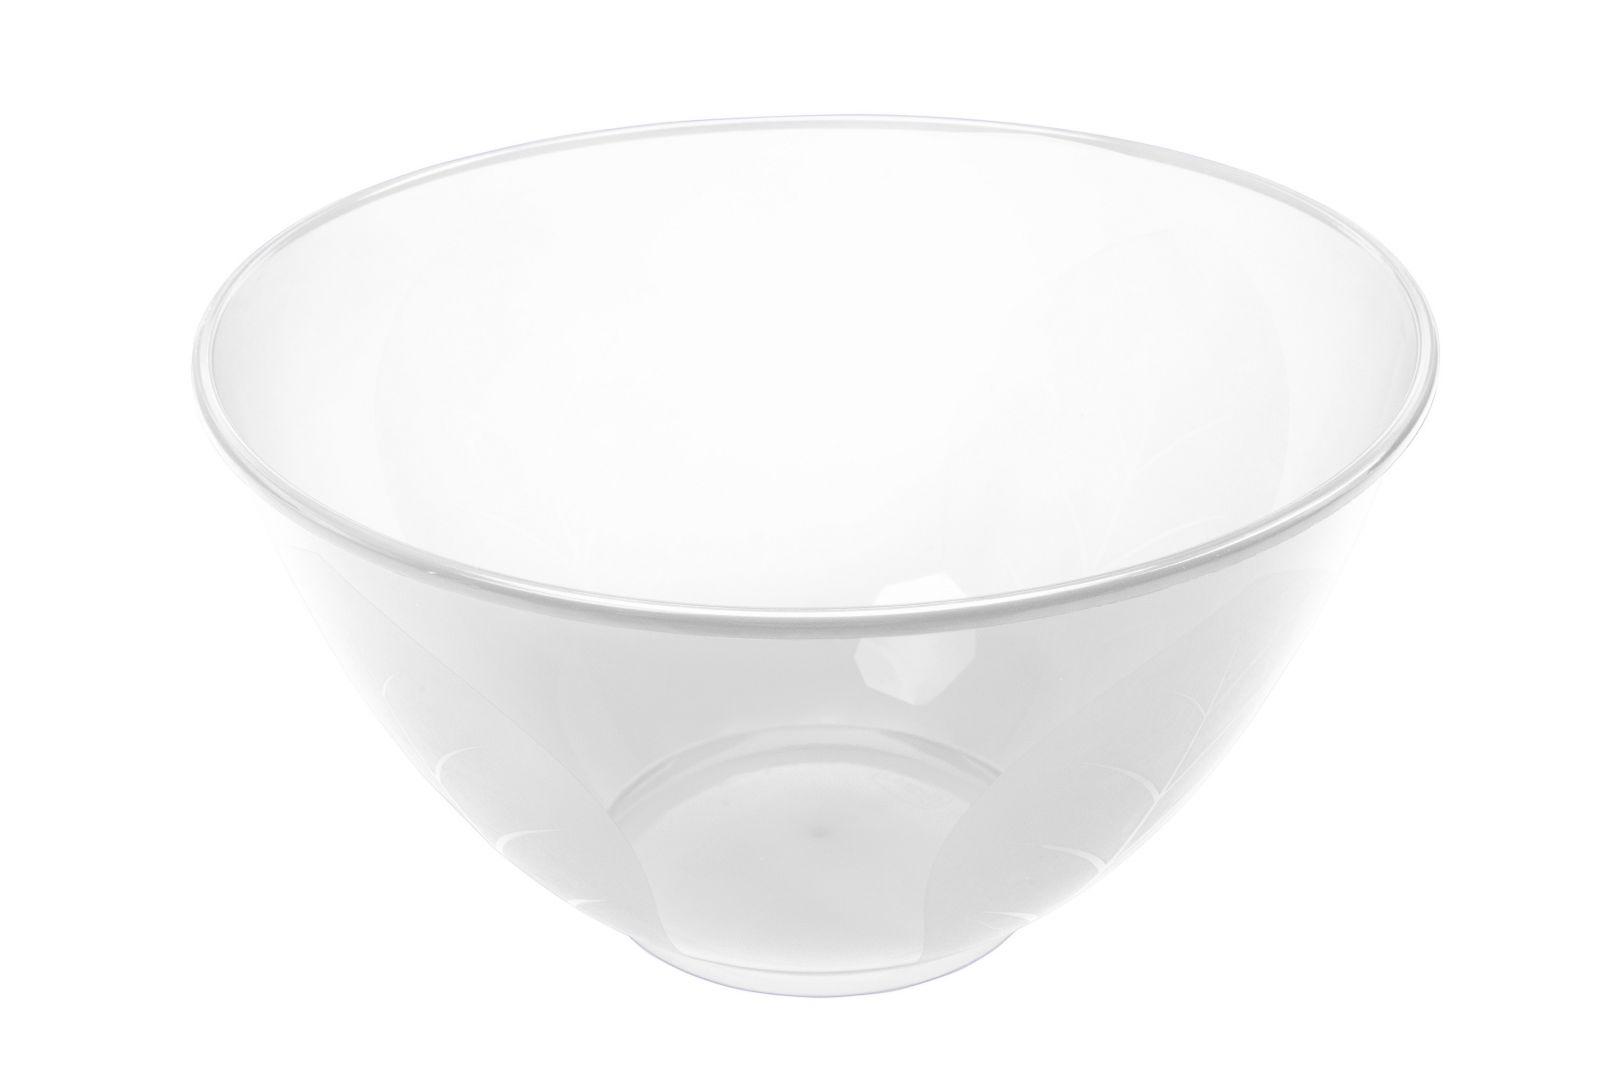 Salátová miska 3l s motivem listu Smart Cook